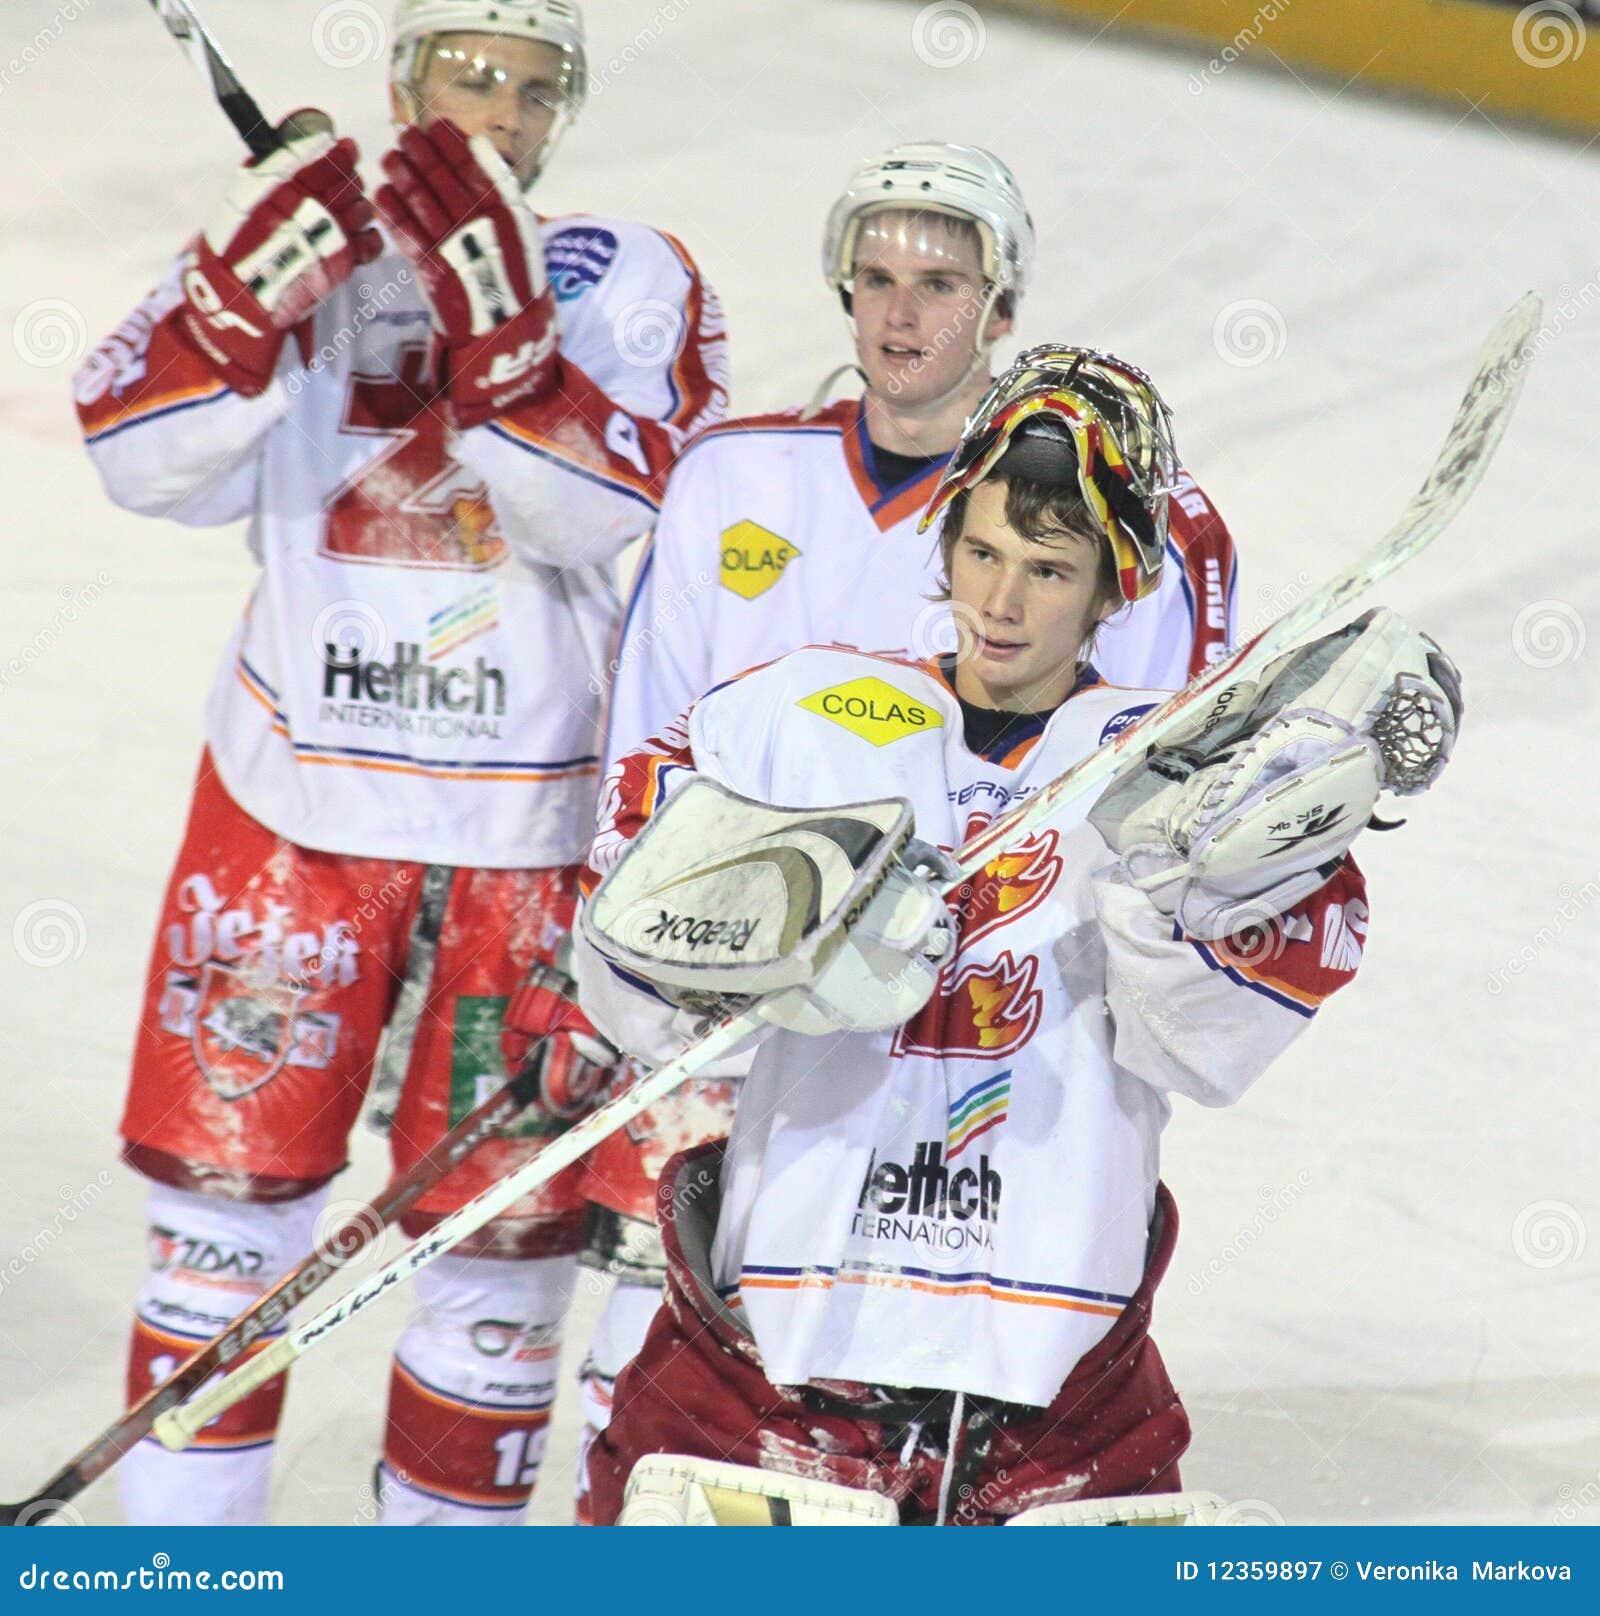 MERCI - allumette de hockey sur glace